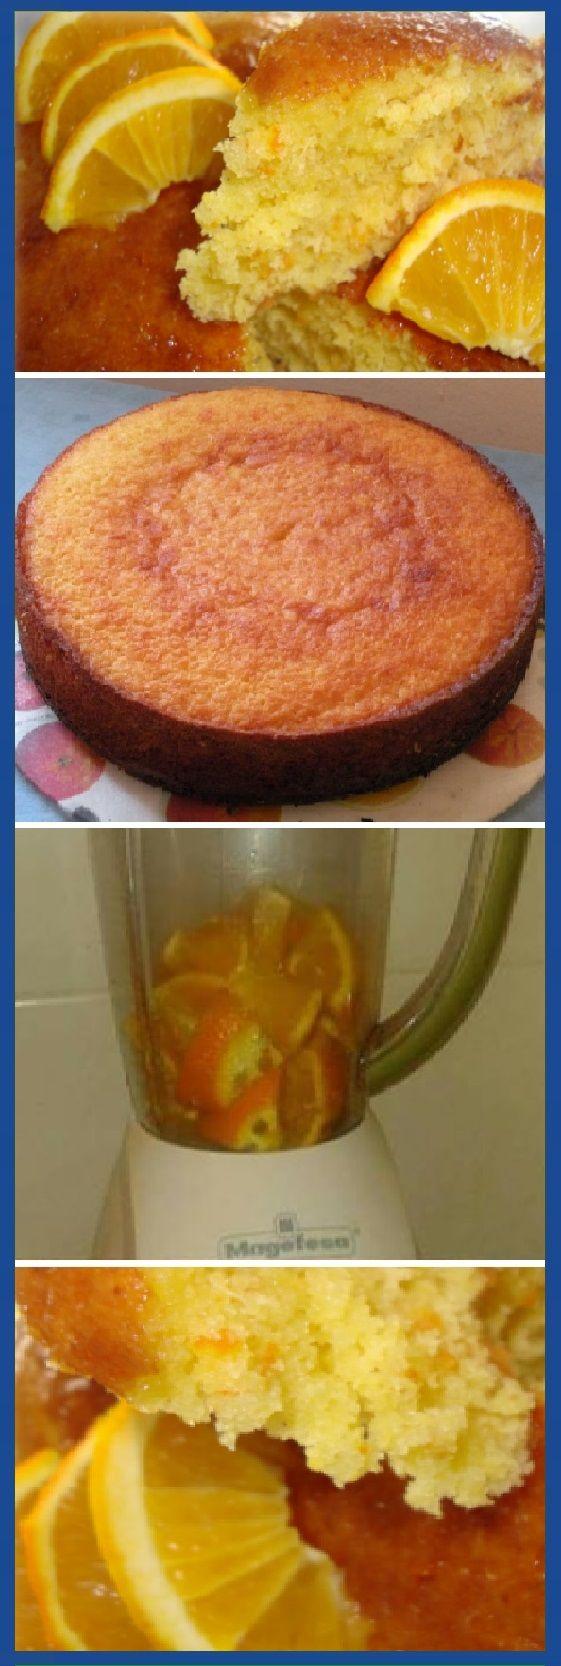 la mejor del mundo TORTA DE NARANJA en LICUADORA queda de mas! #tortanaranja #tortalicuadora #naranja #licuadora #tips #cake #pan #panfrances #panettone #panes #pantone #pan #recetas #recipe #casero #torta #tartas #pastel #nestlecocina #bizcocho #bizcochuelo #tasty #cocina #chocolate Si te gusta dinos HOLA y dale a Me Gusta MIREN...